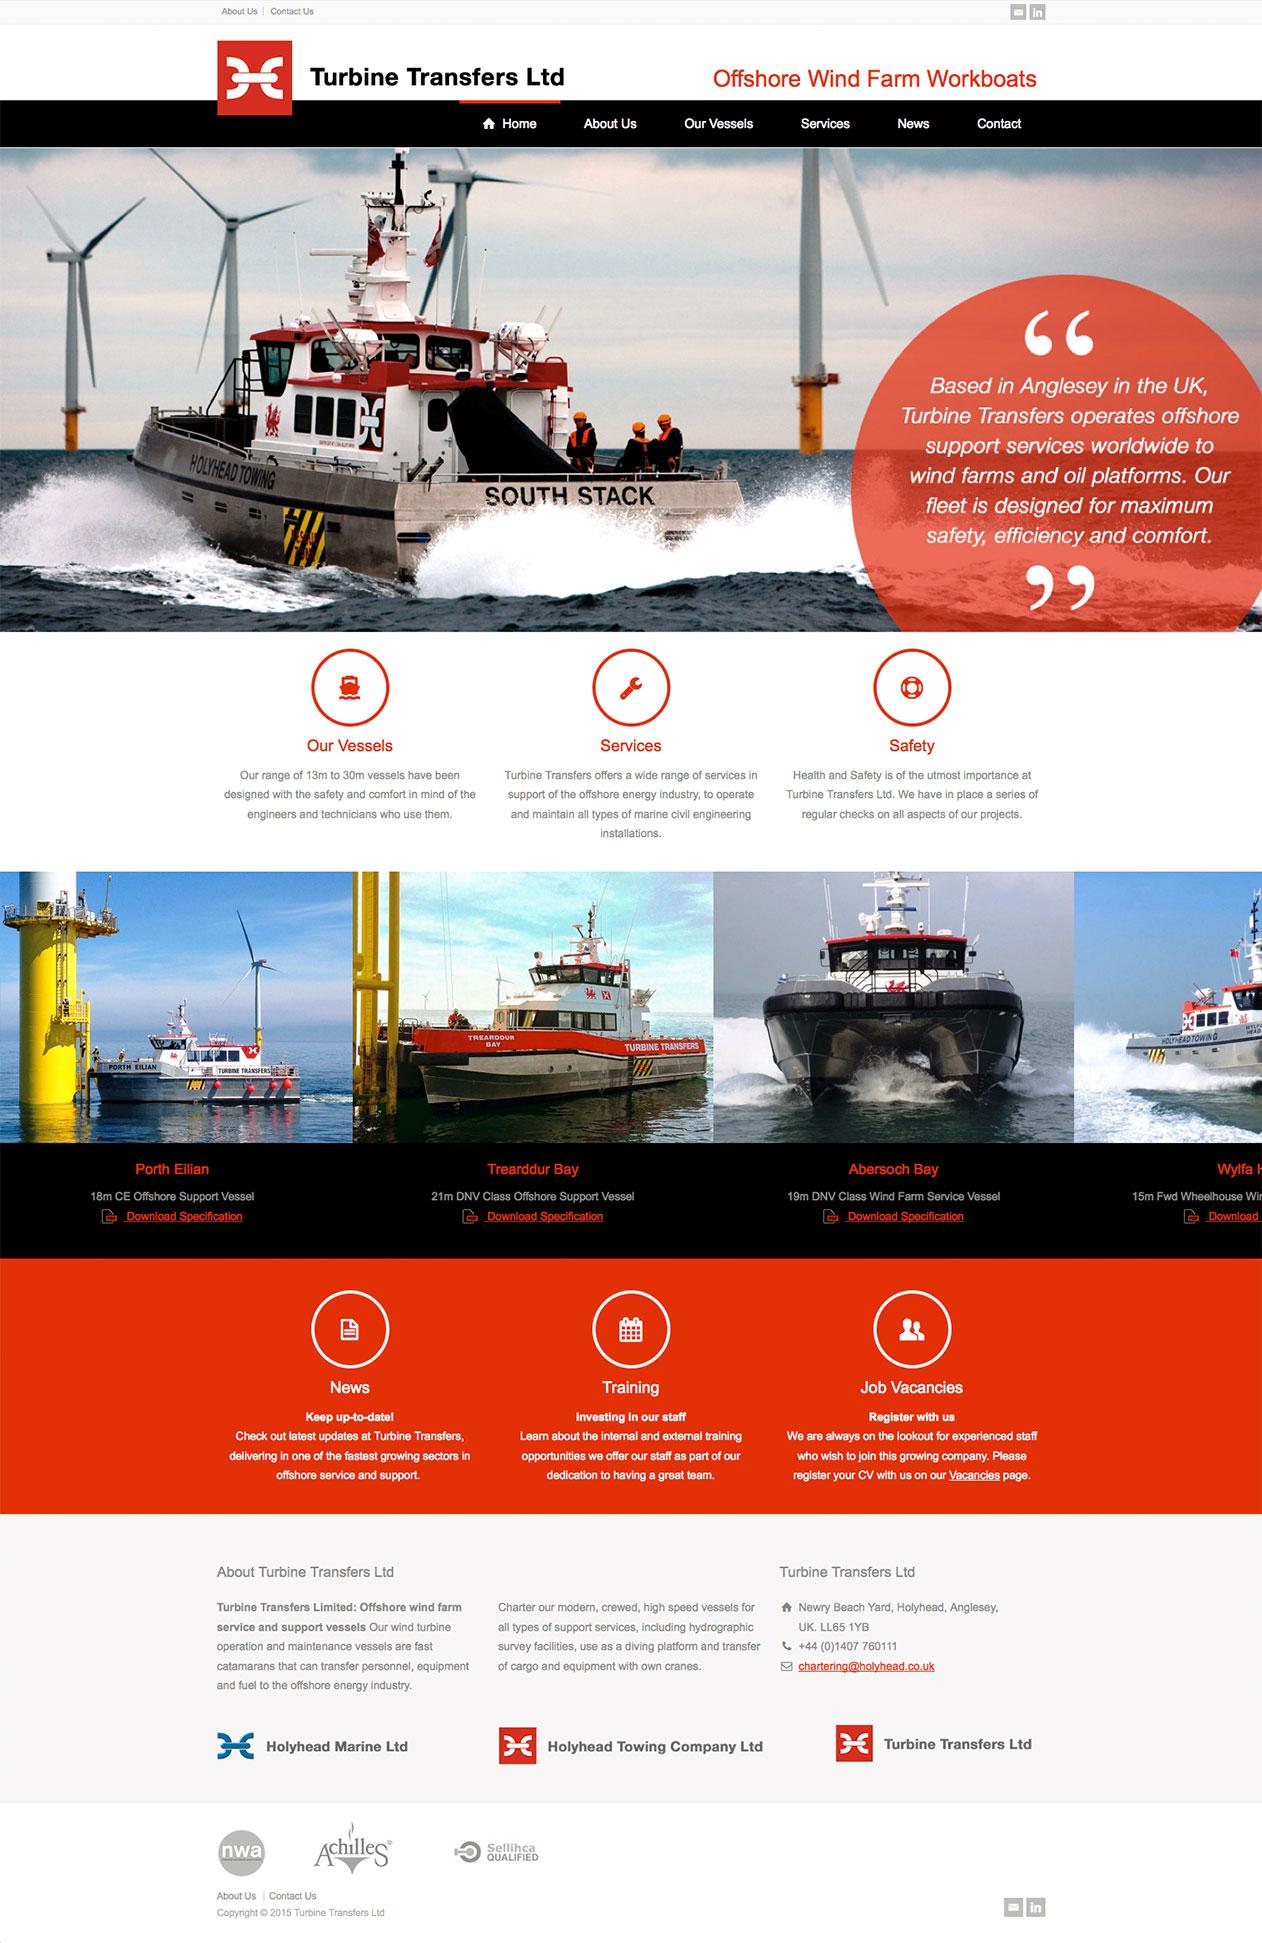 Turbine Transfers website